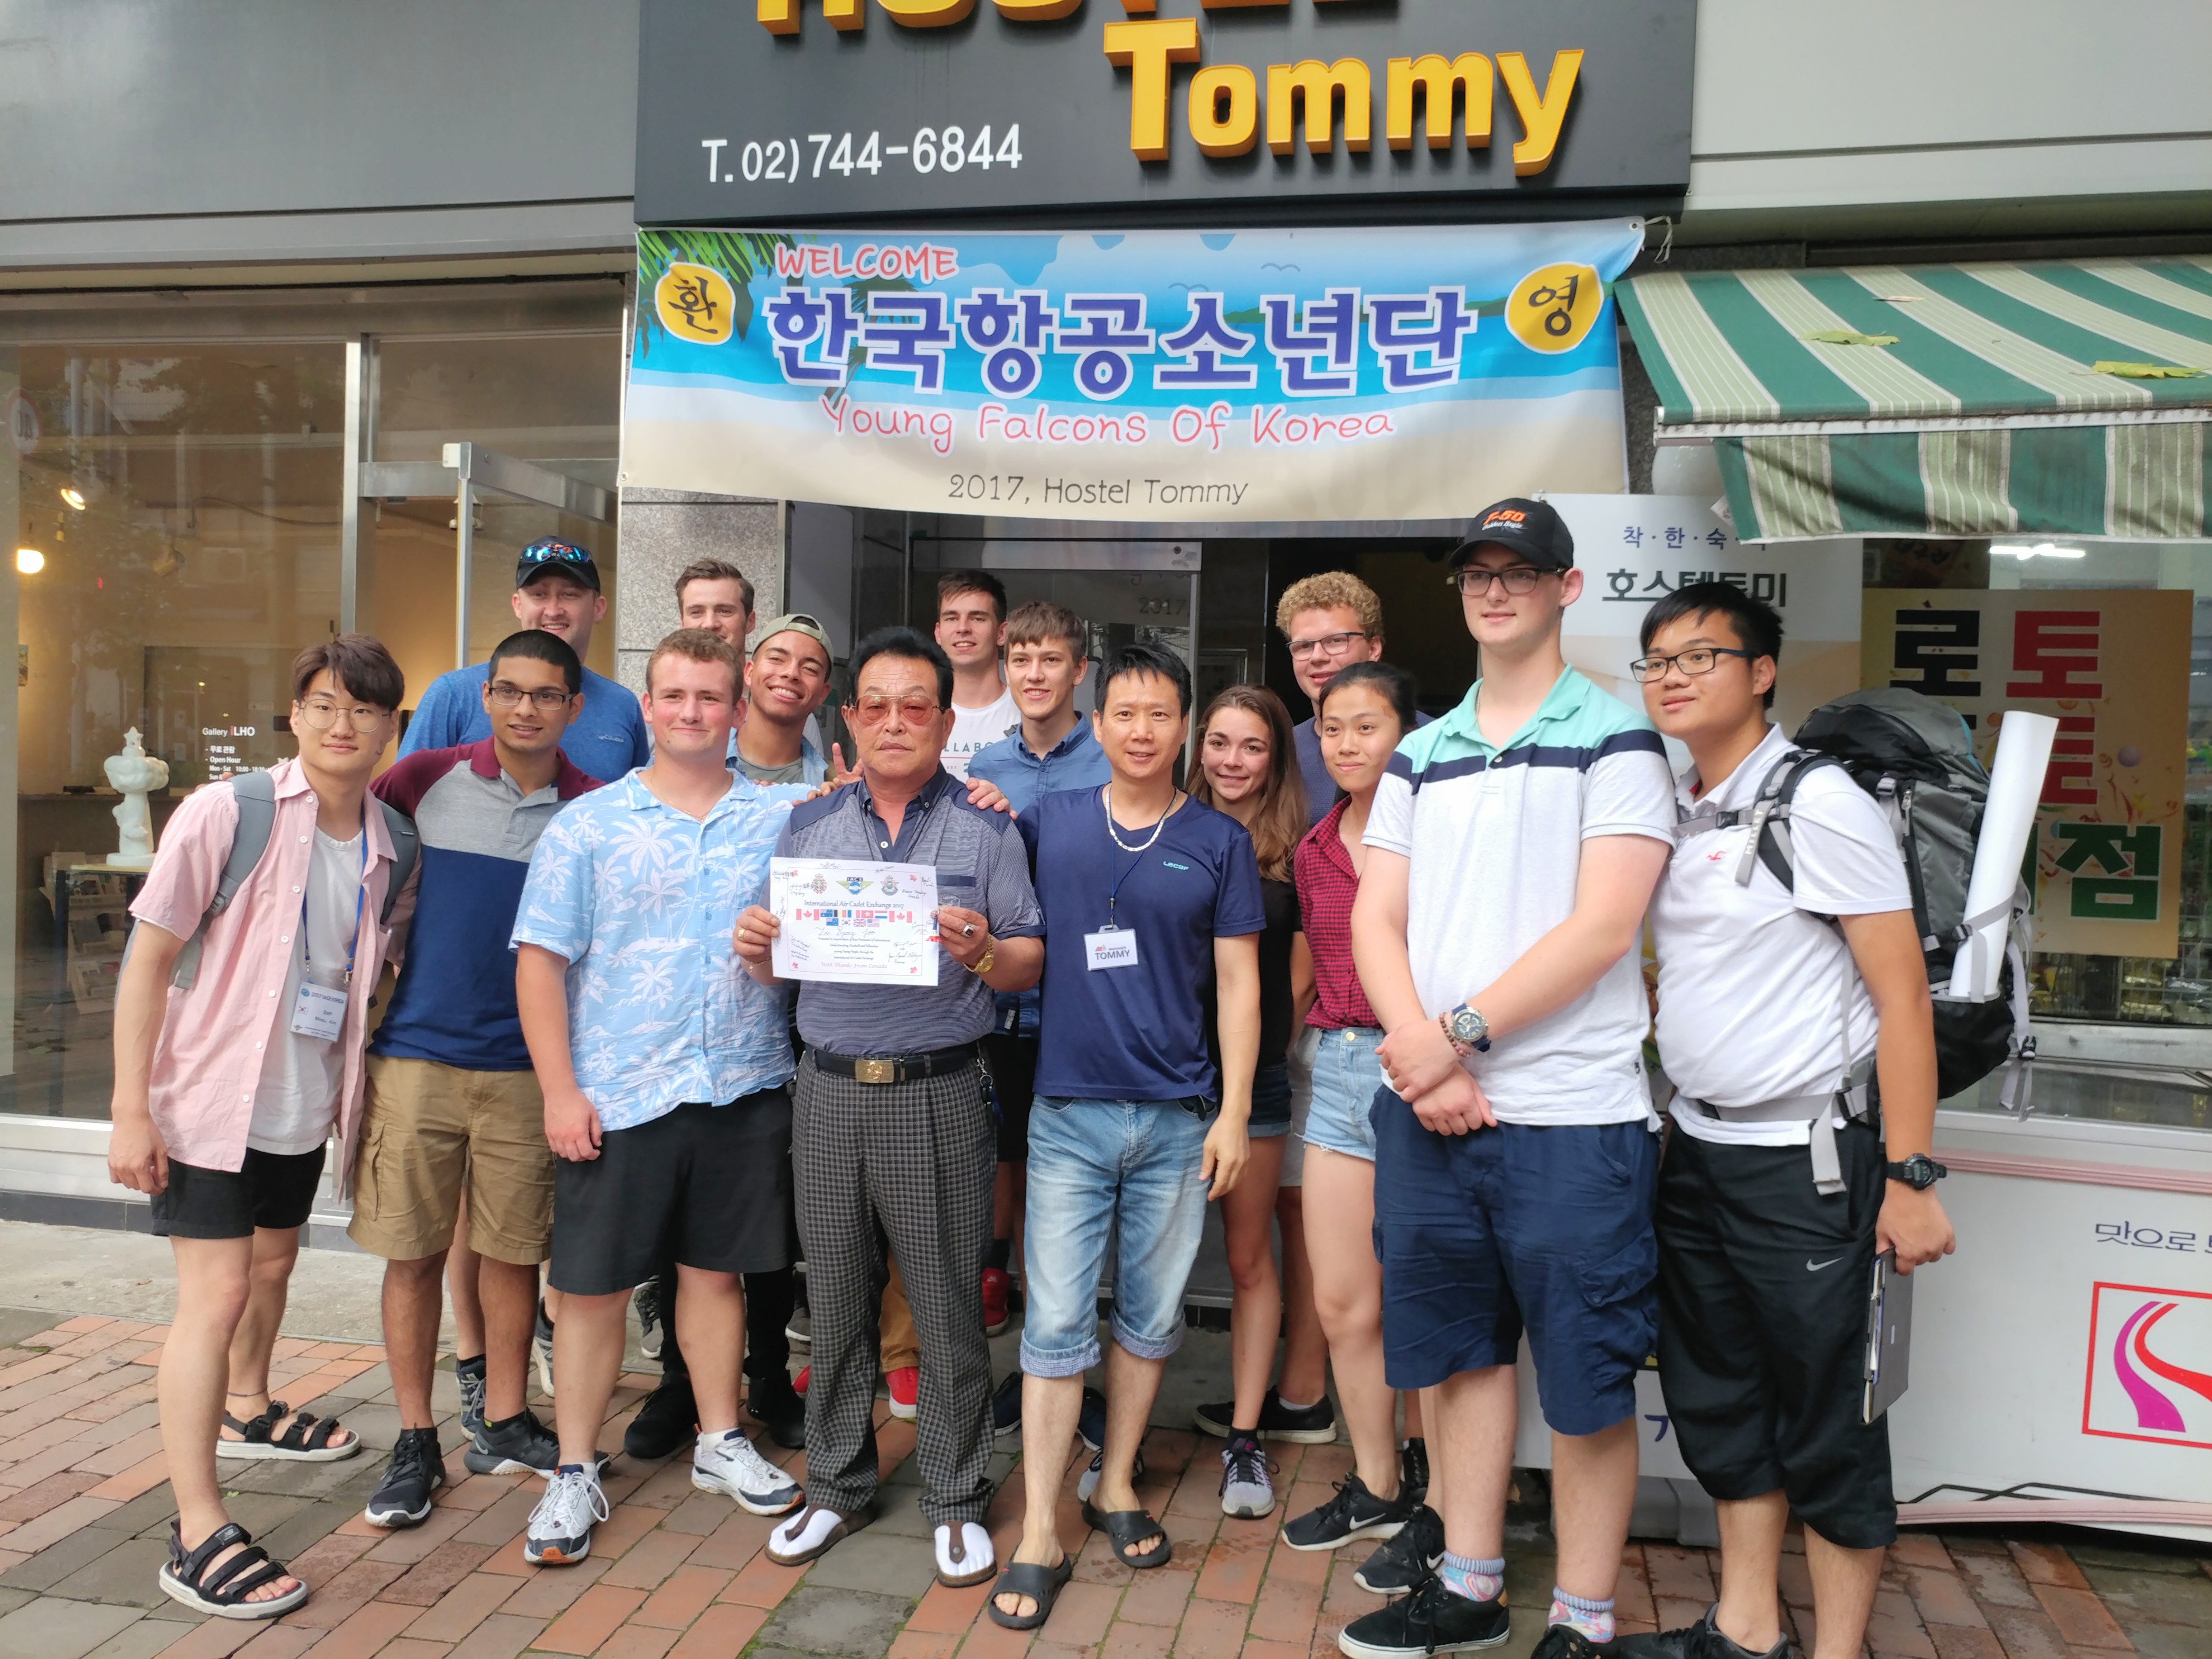 YOUNG FALCONS OF KOREA